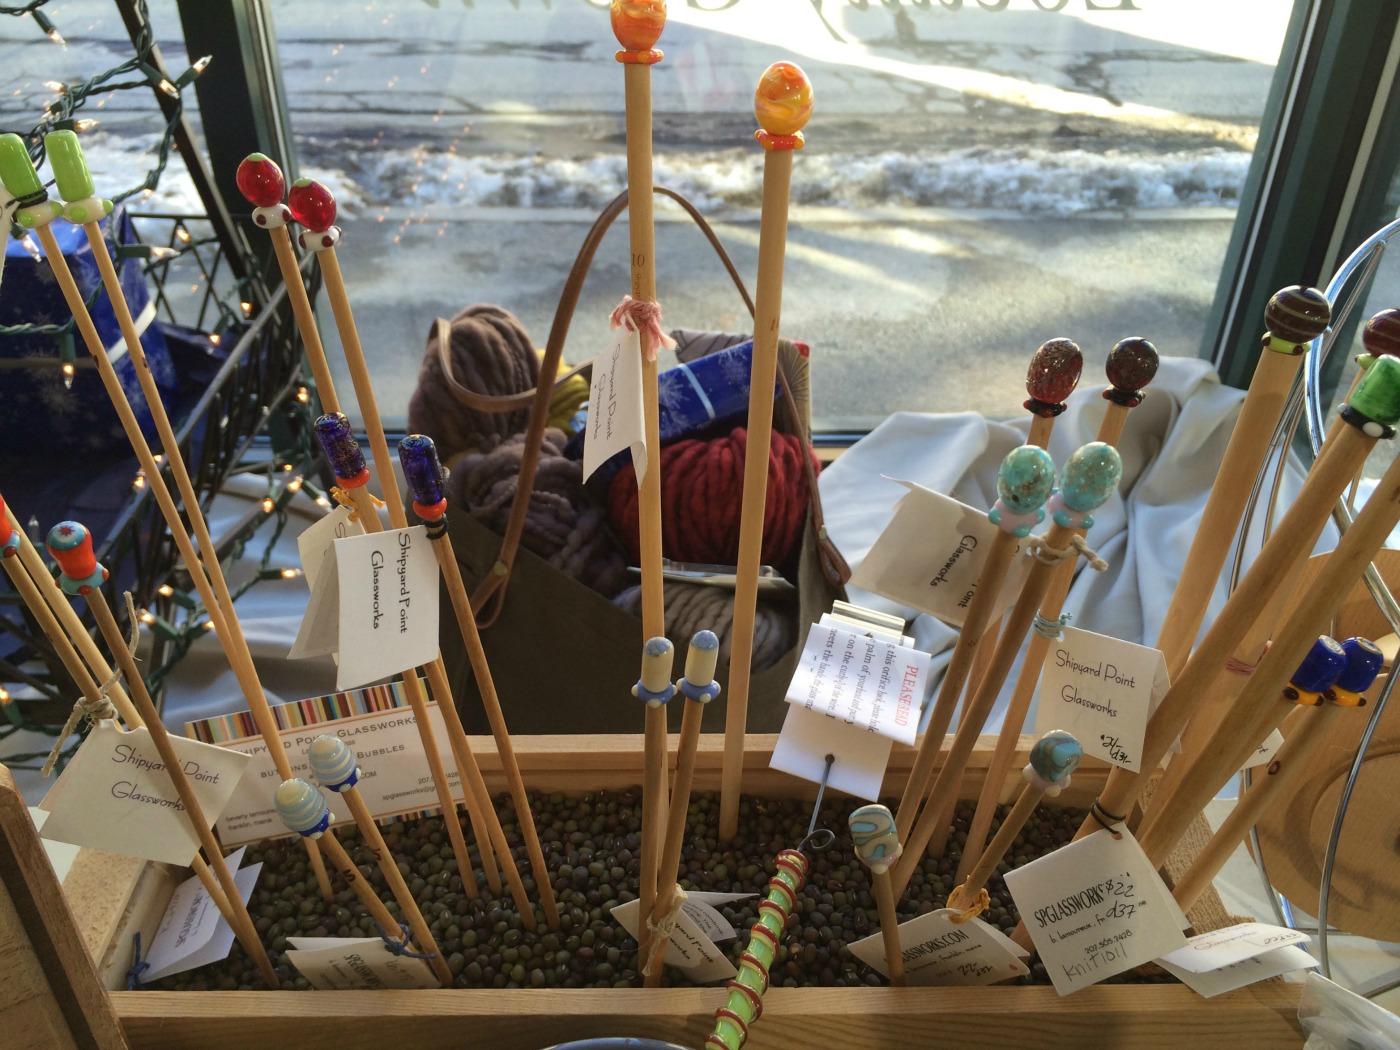 shipyard glass knitting needles